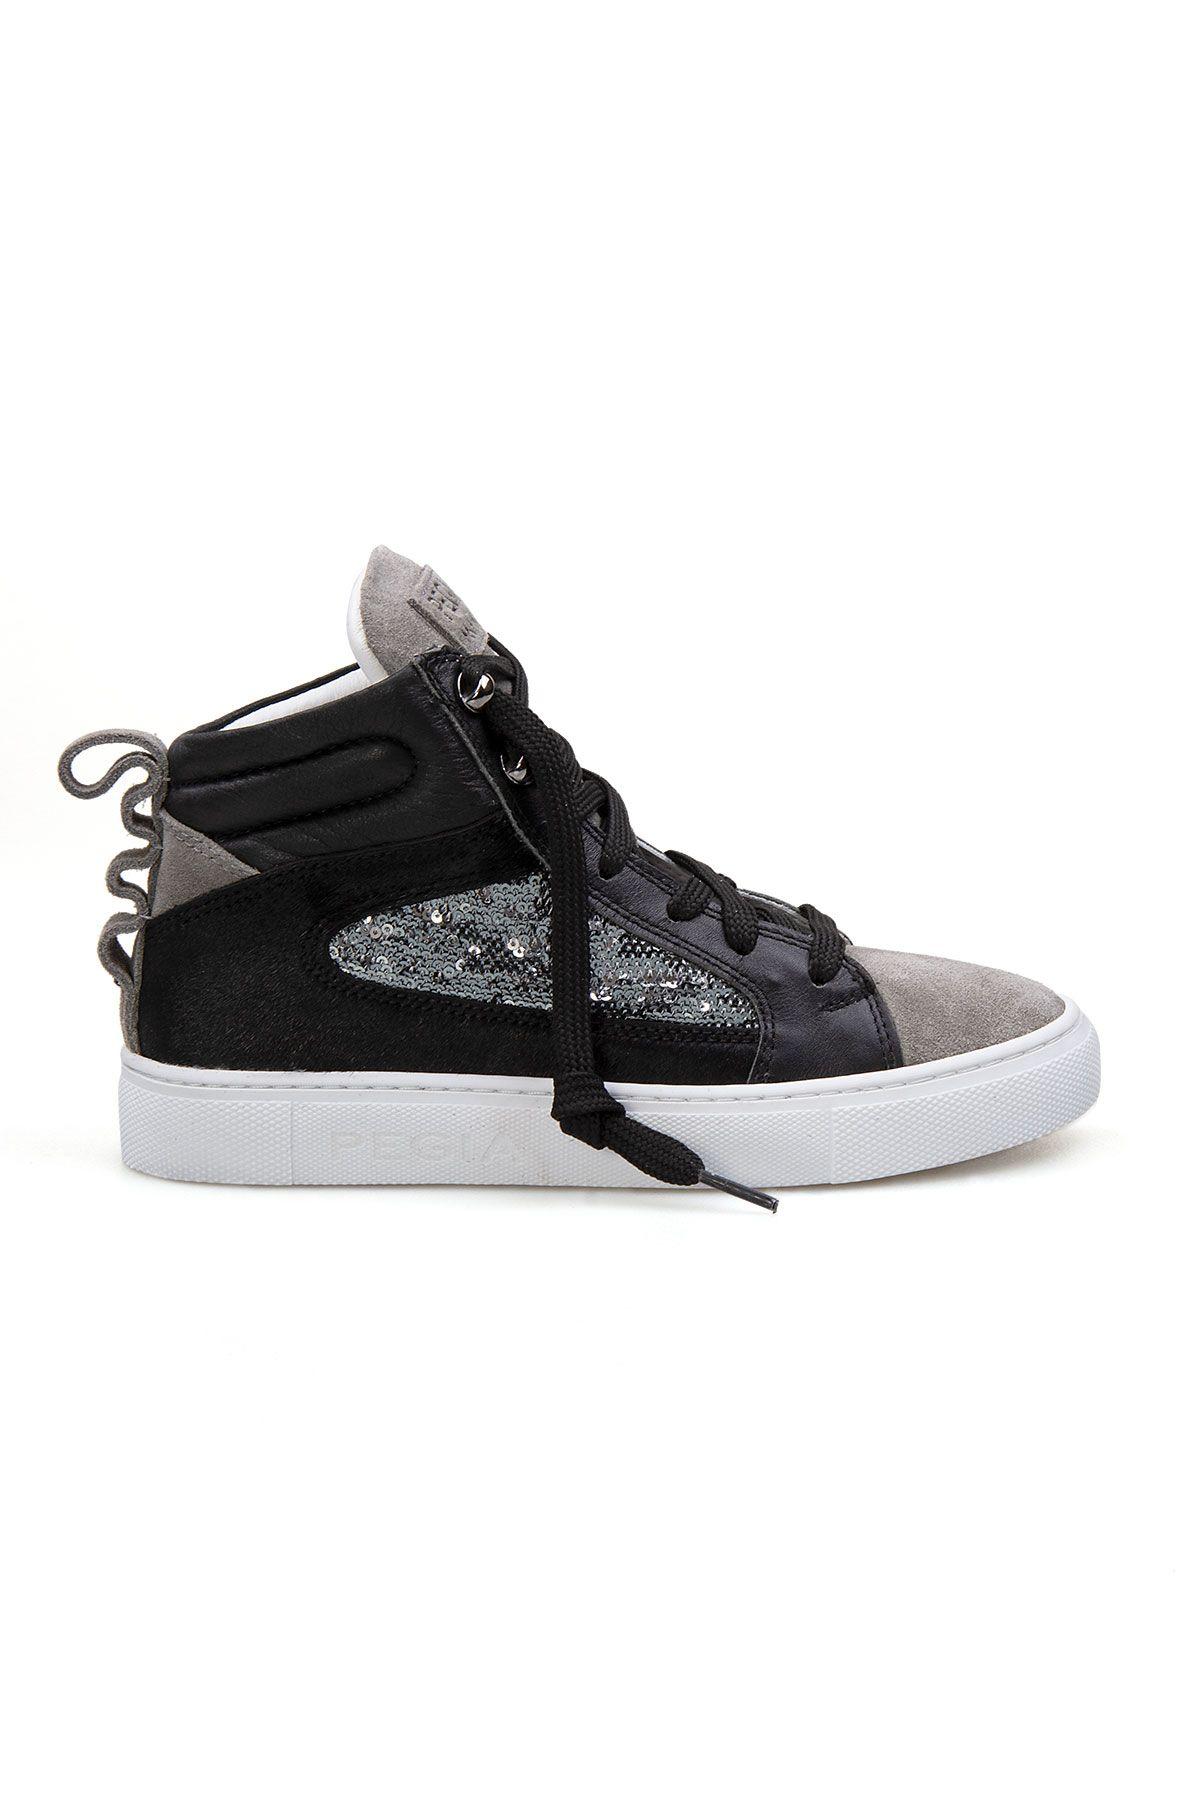 Pegia Genuine Leather Sequined Sneaker LA1201 Gray